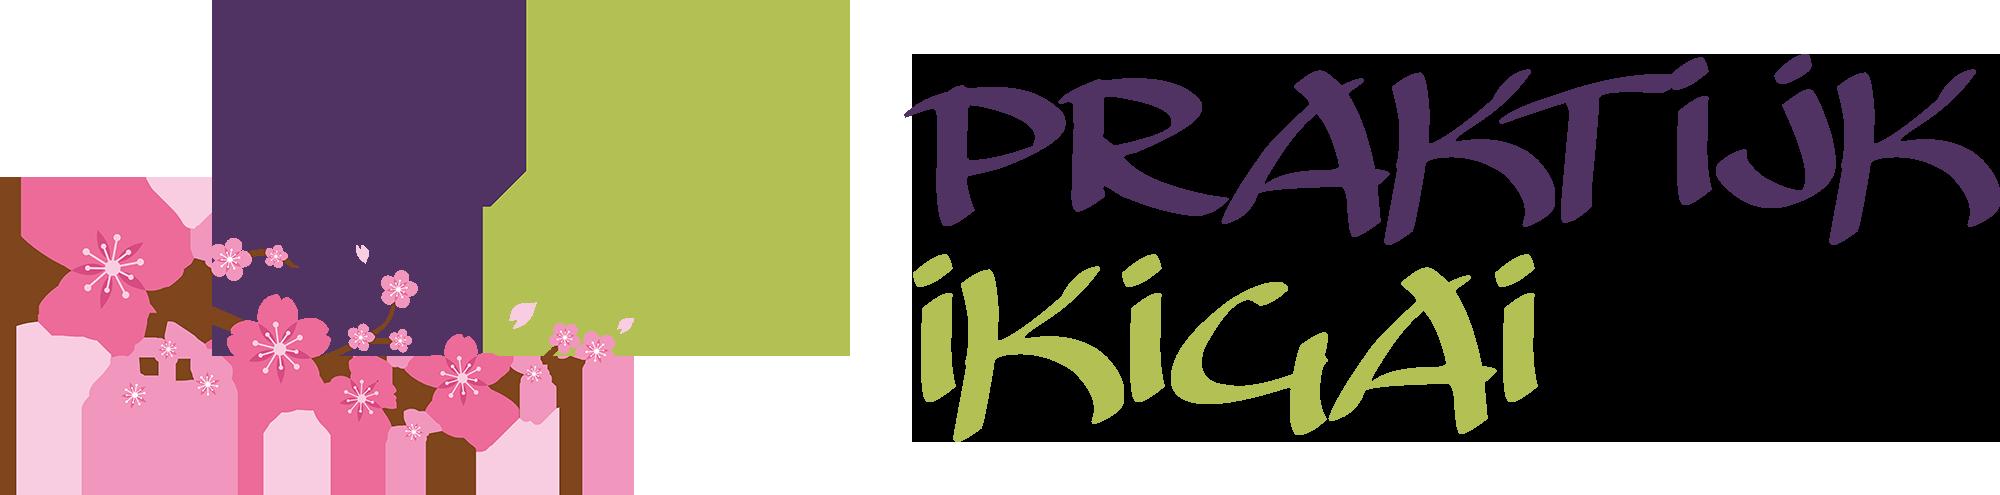 Praktijk Ikigai logo website